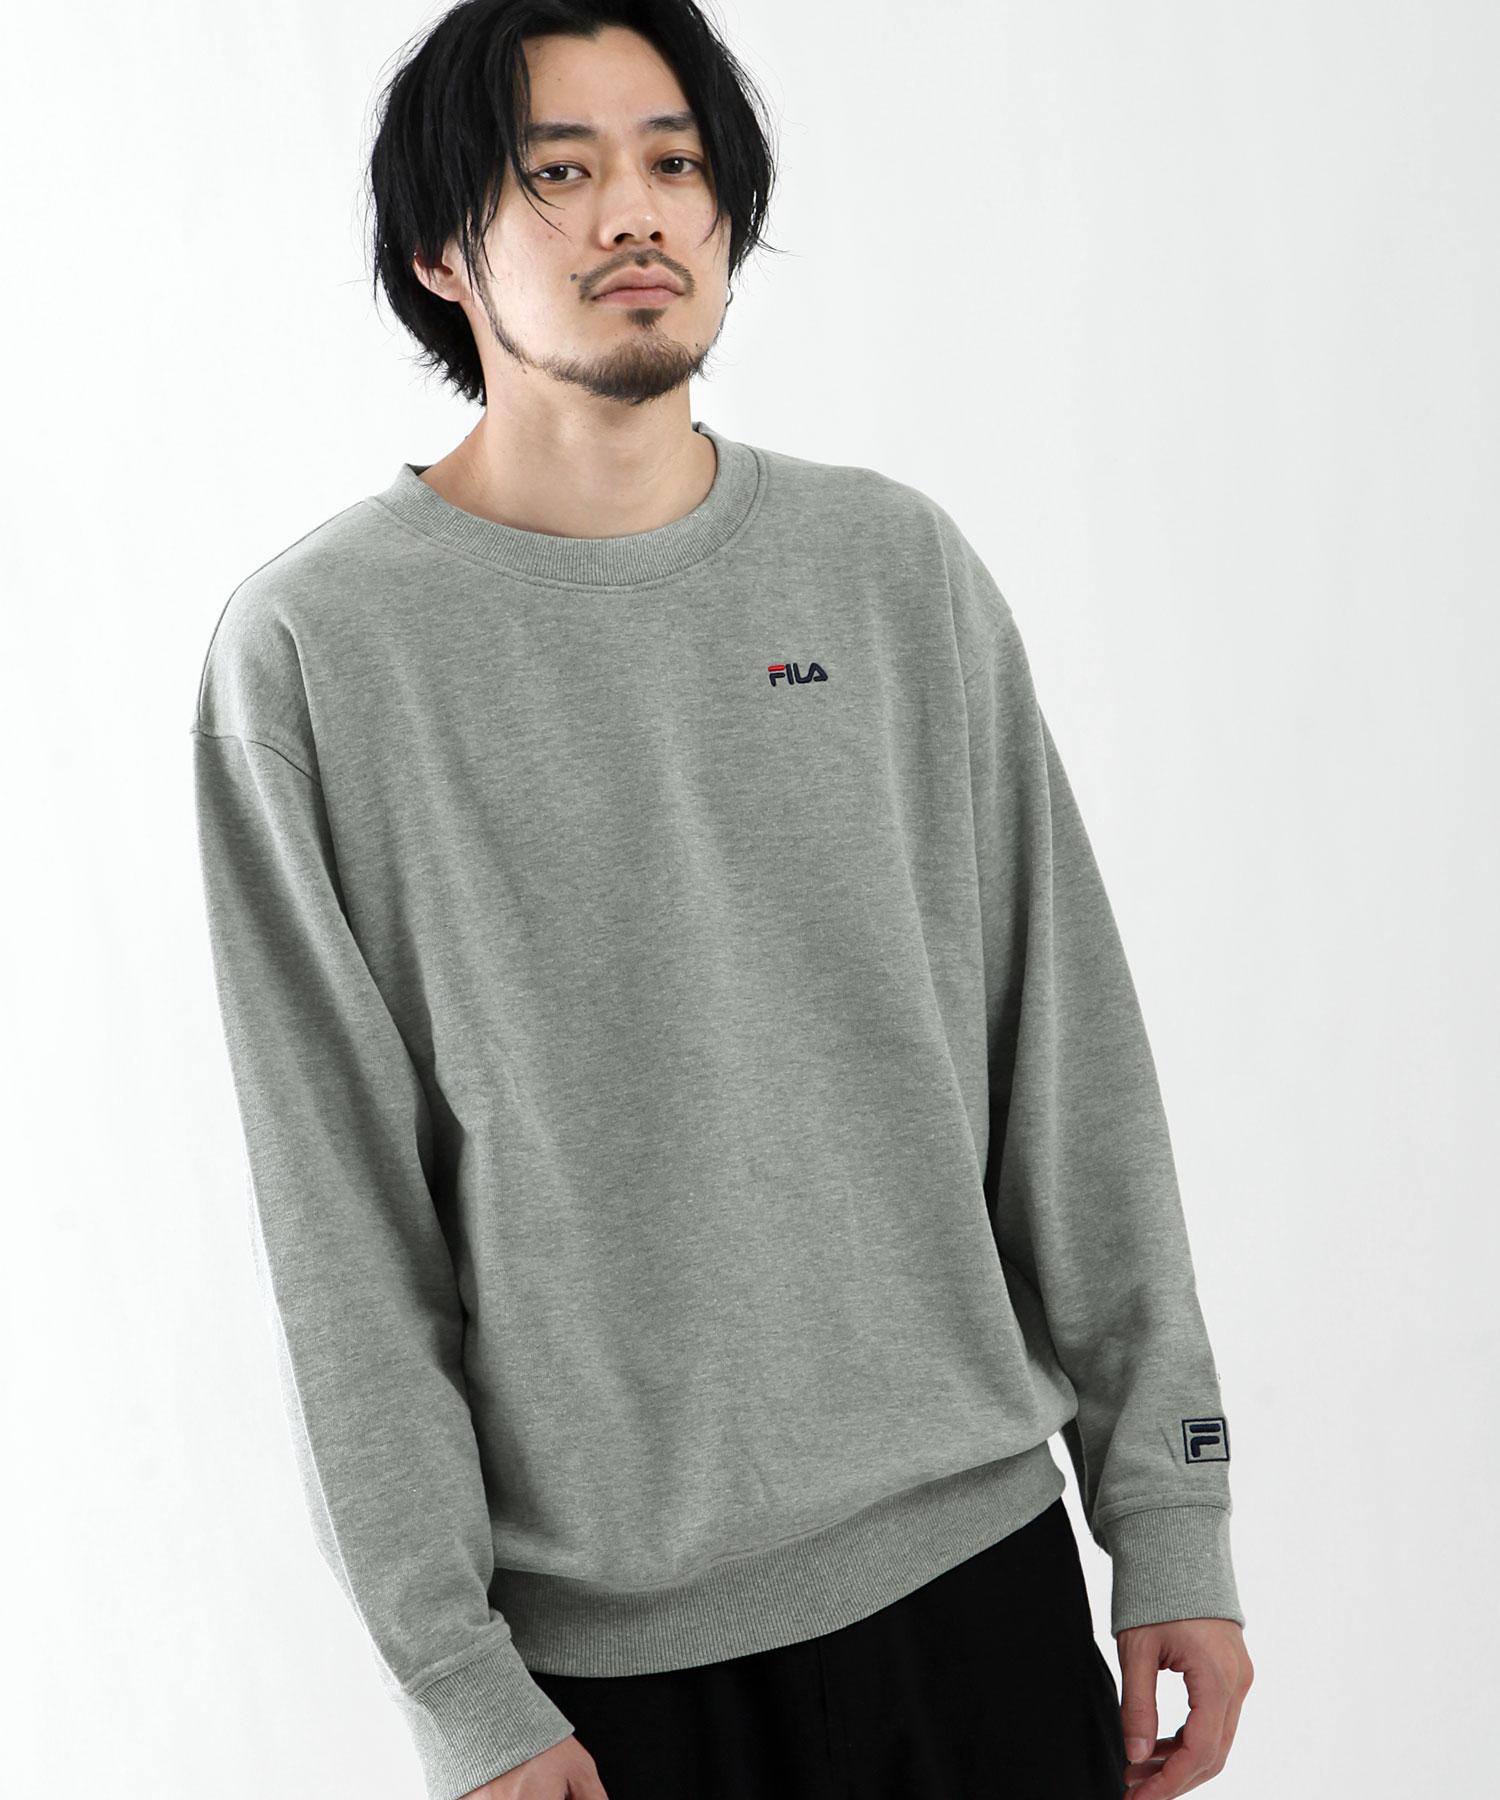 【FILA】LOGO刺繡運動衫 4